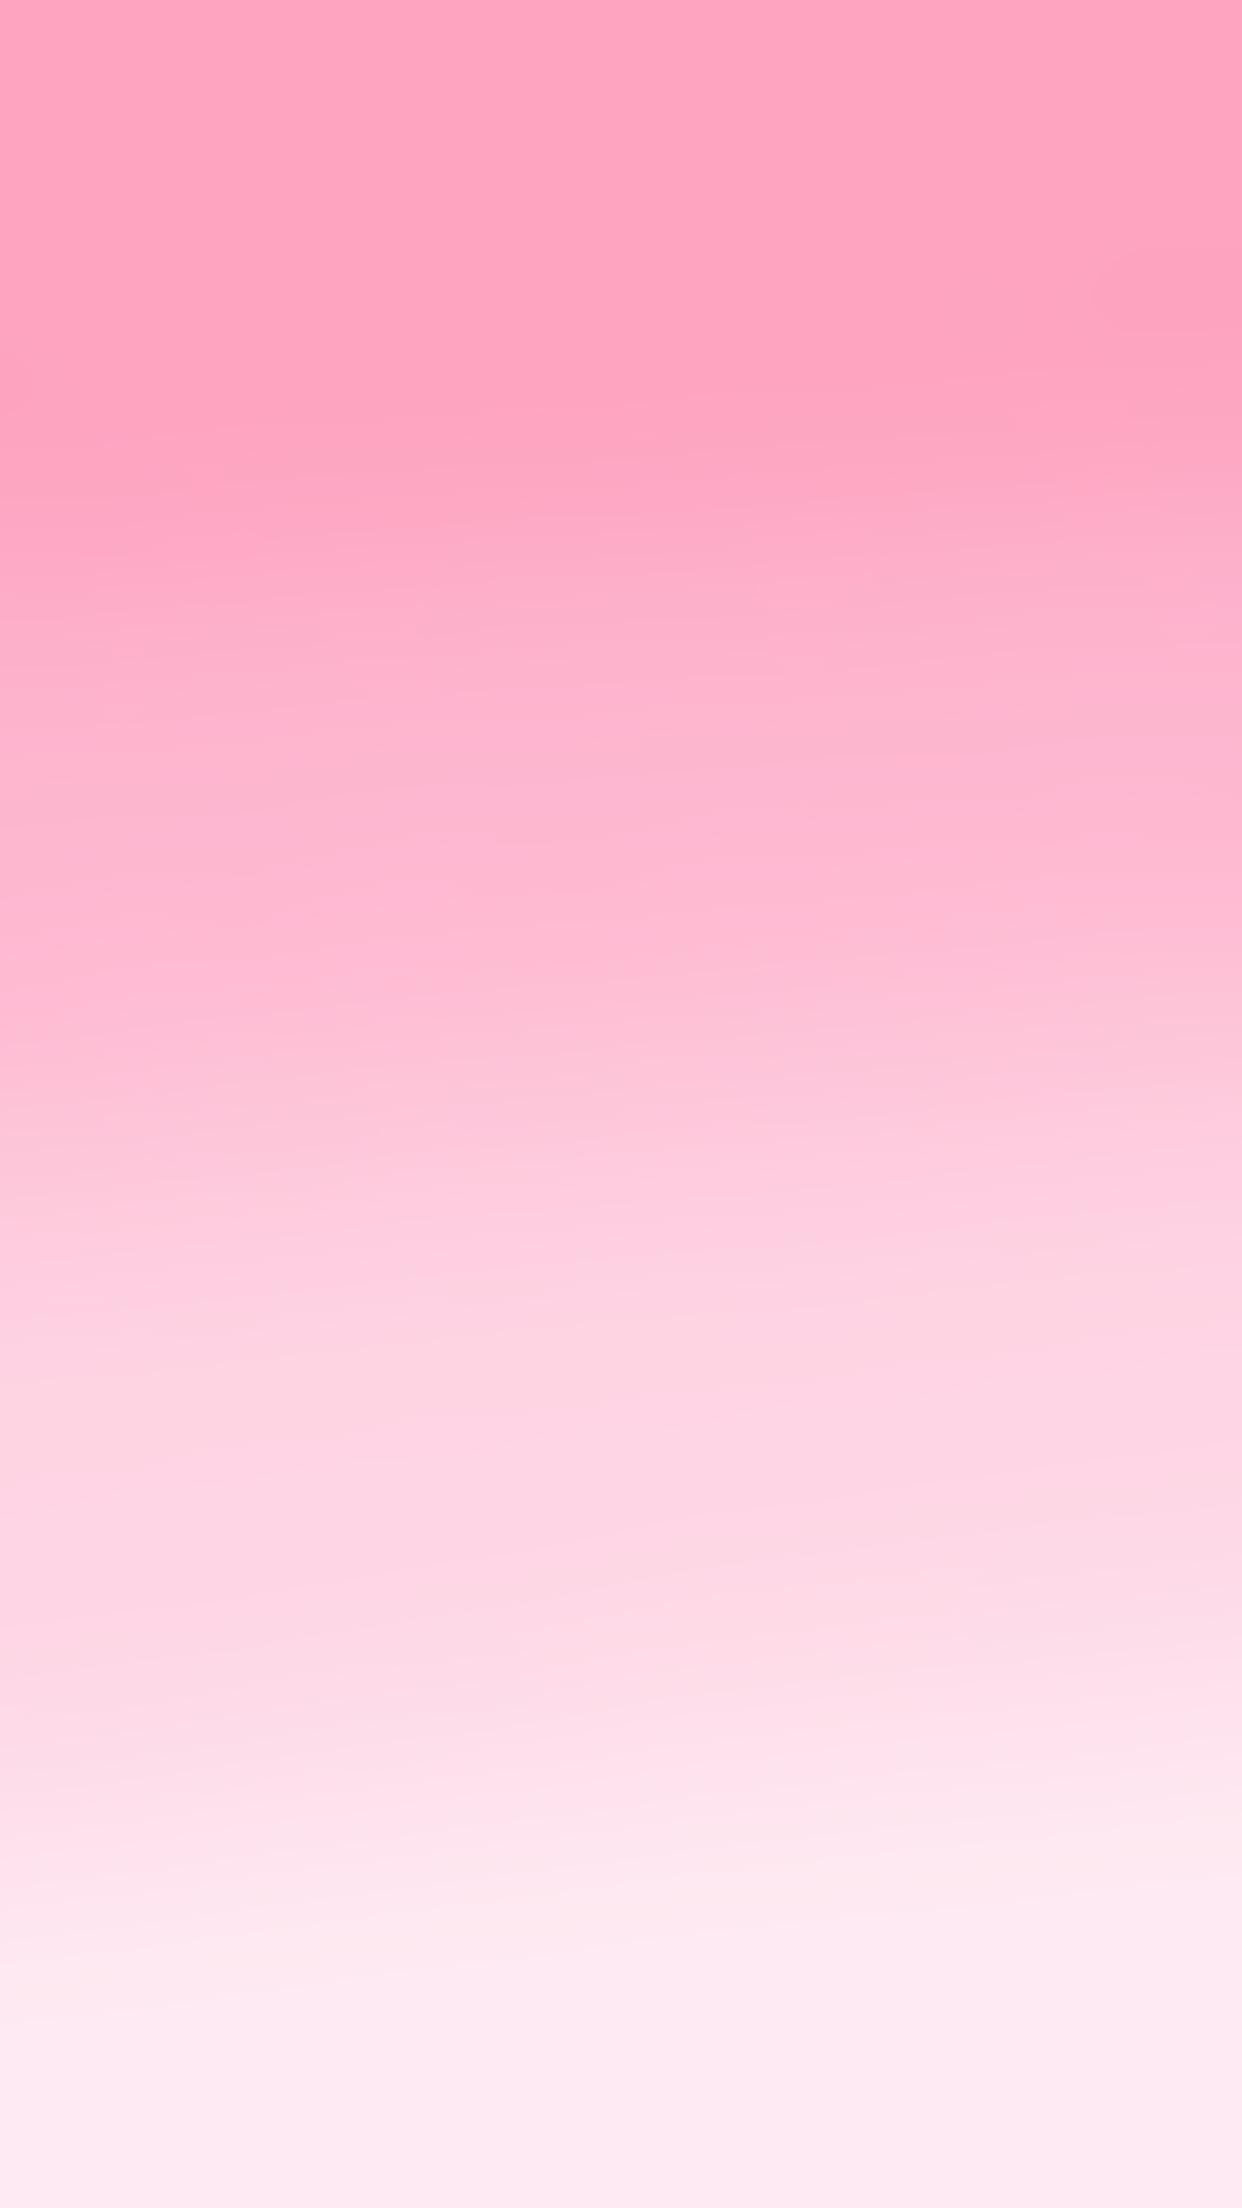 fond d écran iphone rose